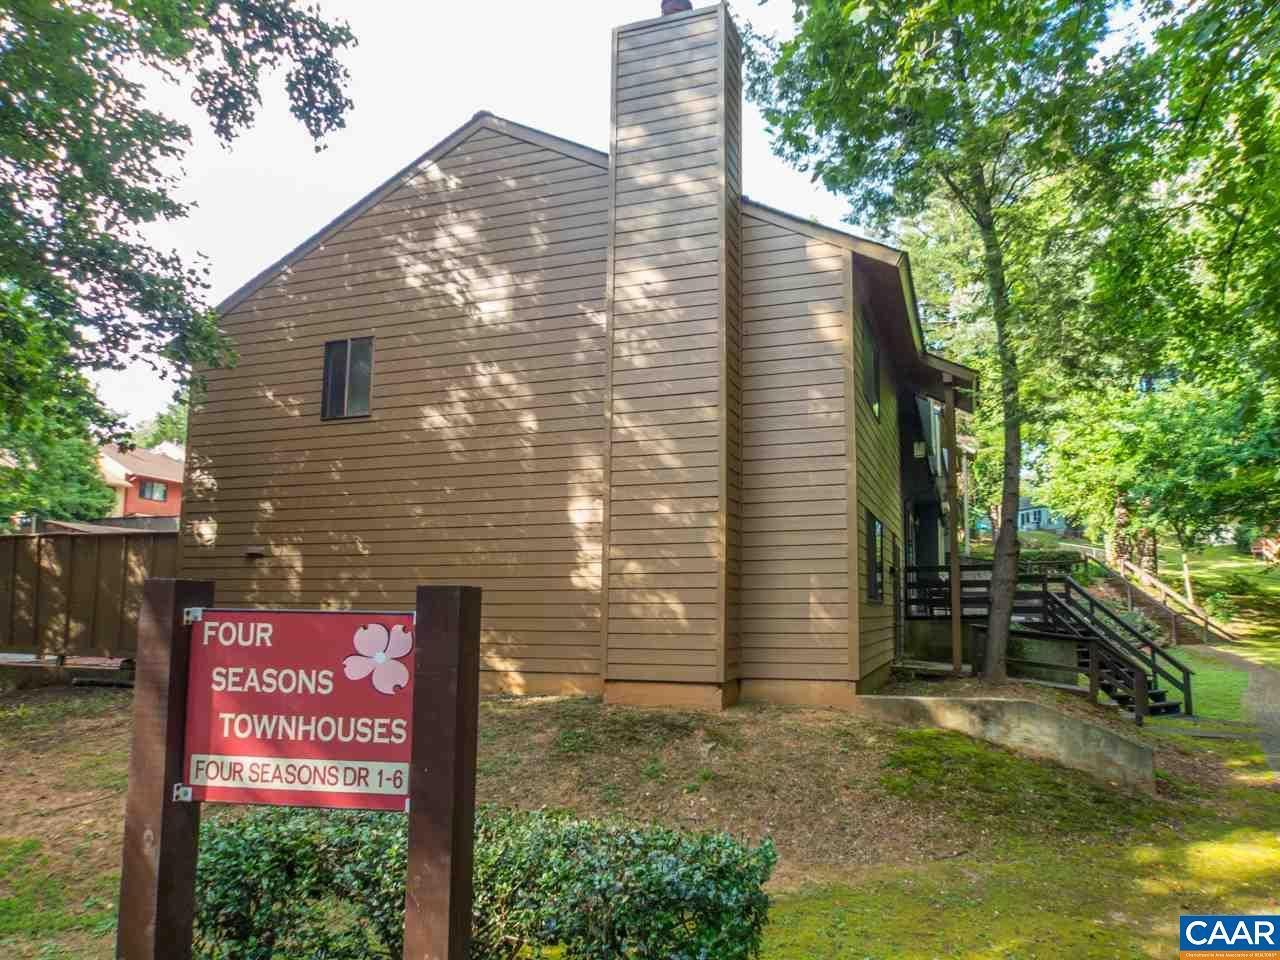 Better homes and gardens real estate iii va - Charlottesville Va 22901